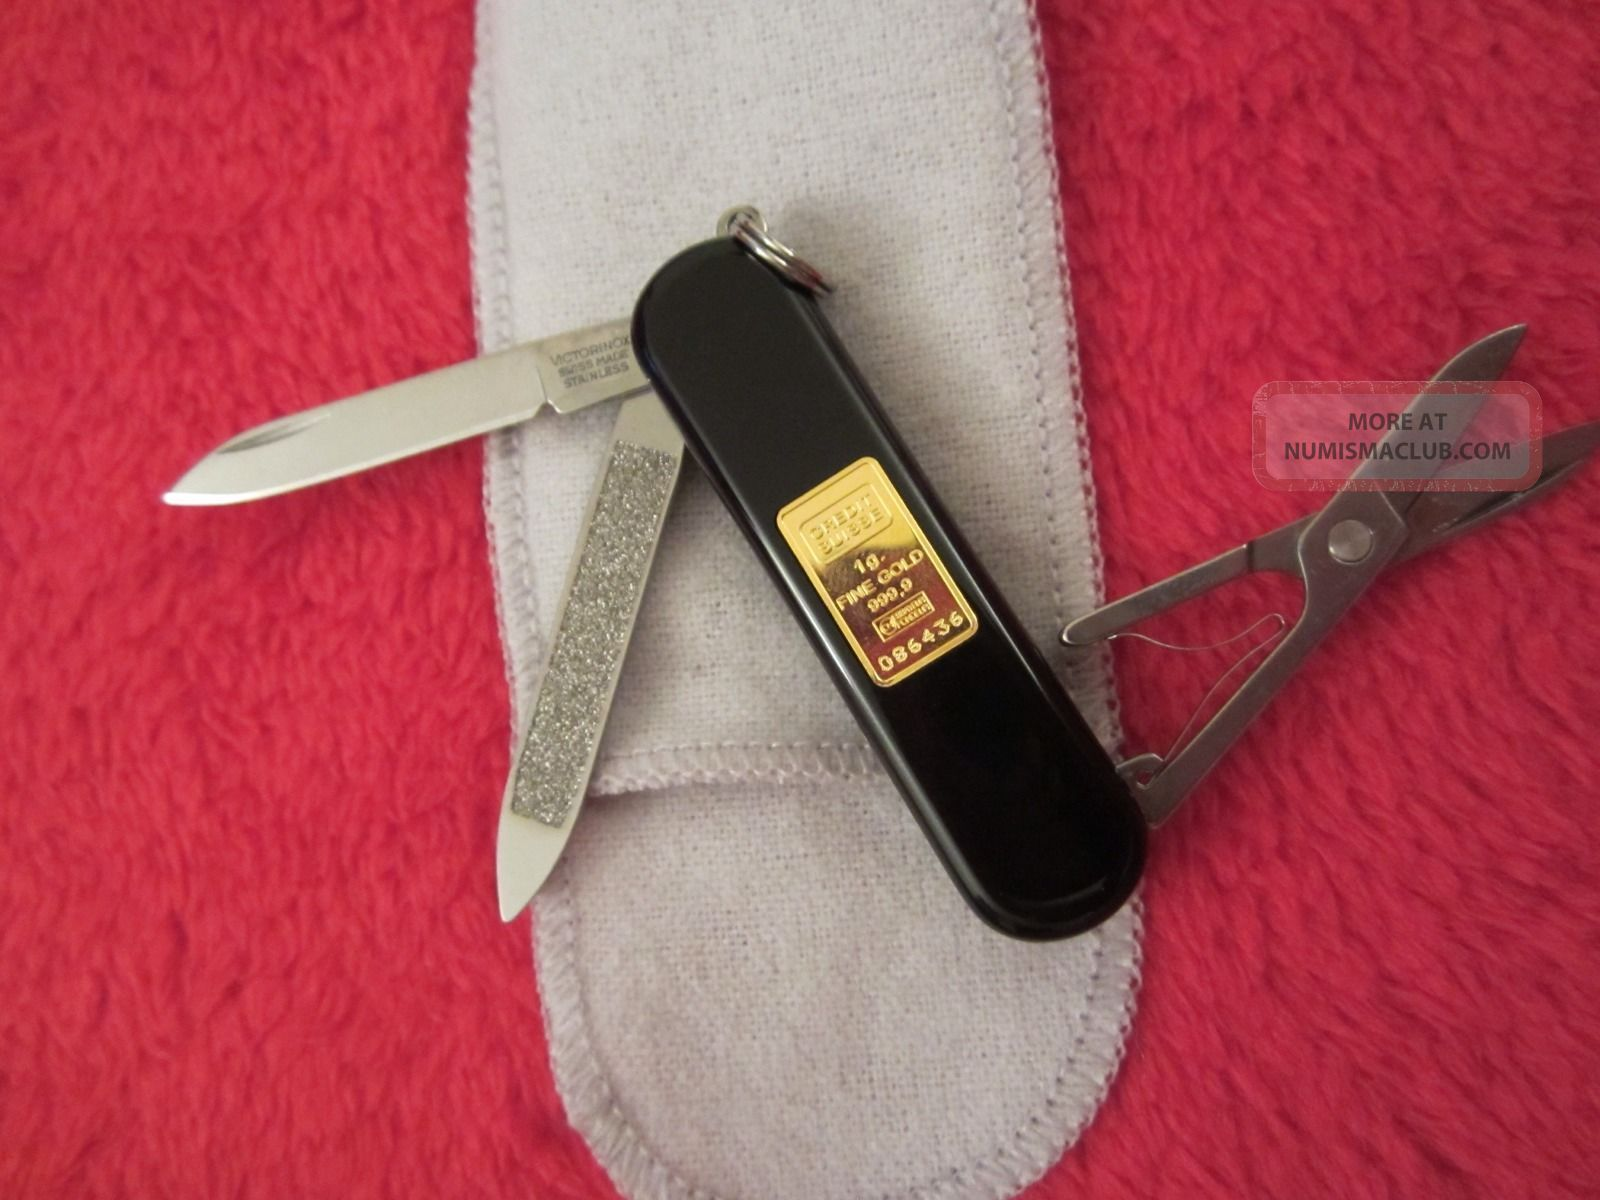 Wow Ultra Rare Victorinox Swiss Army Knife W 1g Credit